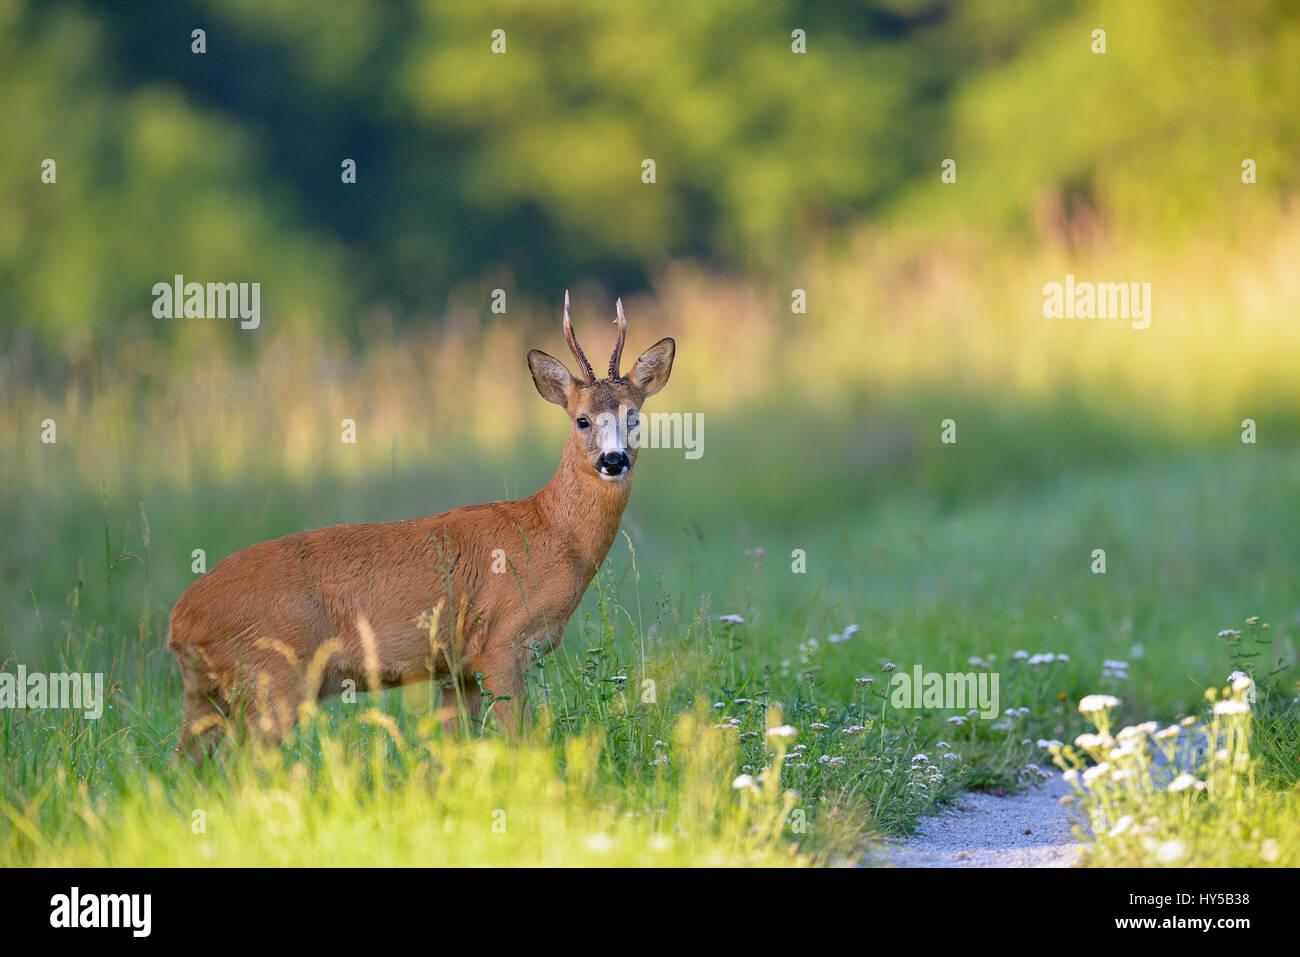 Sweden, Uppland, Lidingo, European roe deer (Capreolus capreolus) in meadow - Stock Image